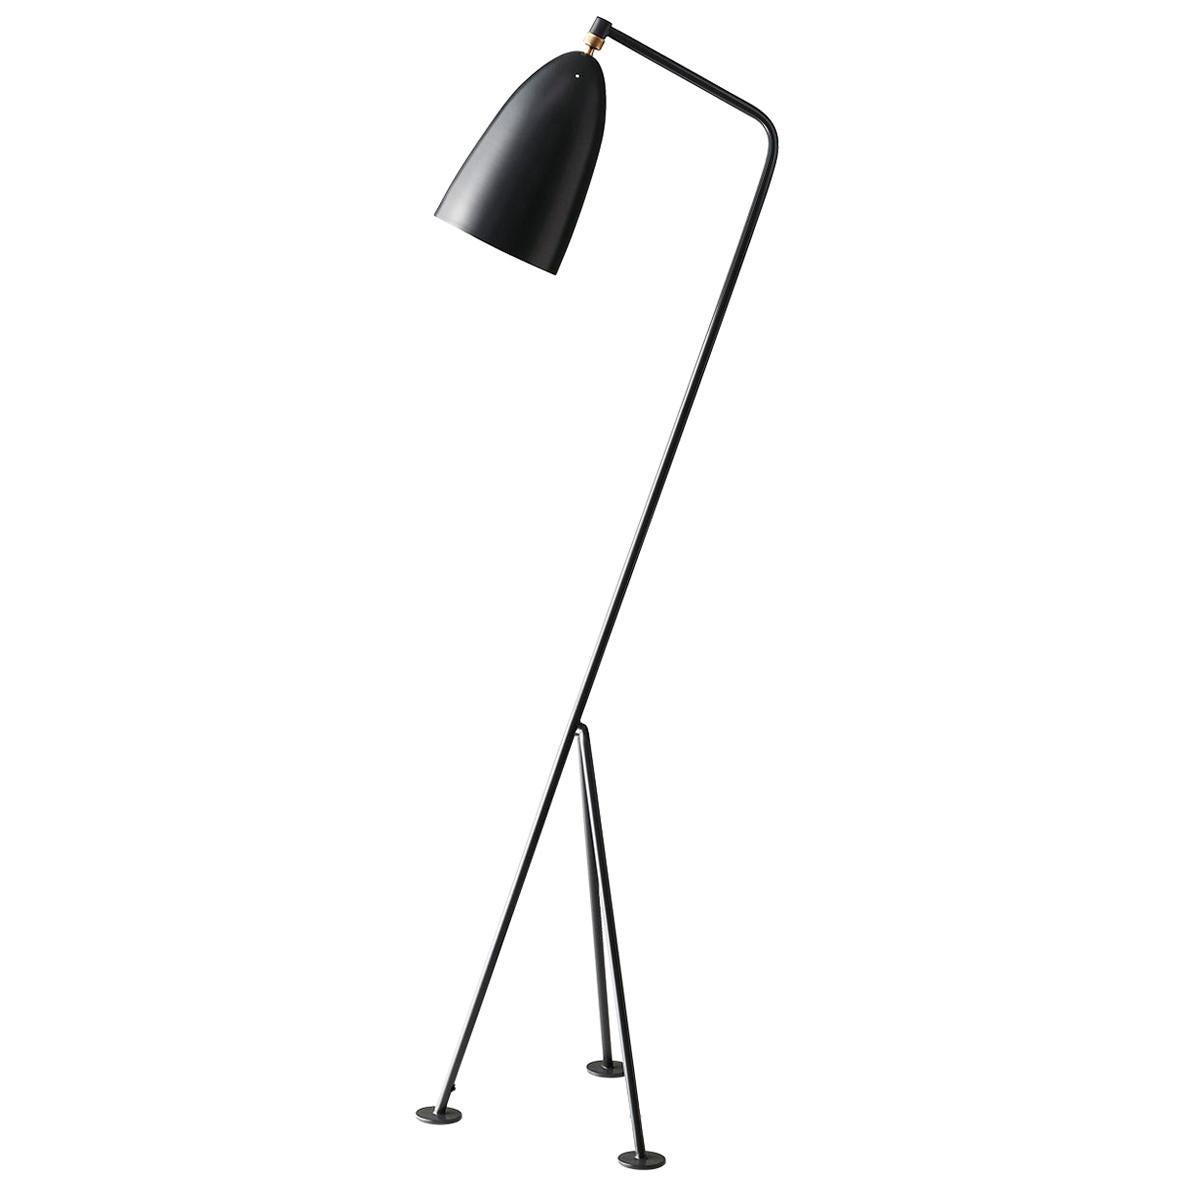 Greta Grossman Grasshopper Floor Lamp, Anthracite Grey